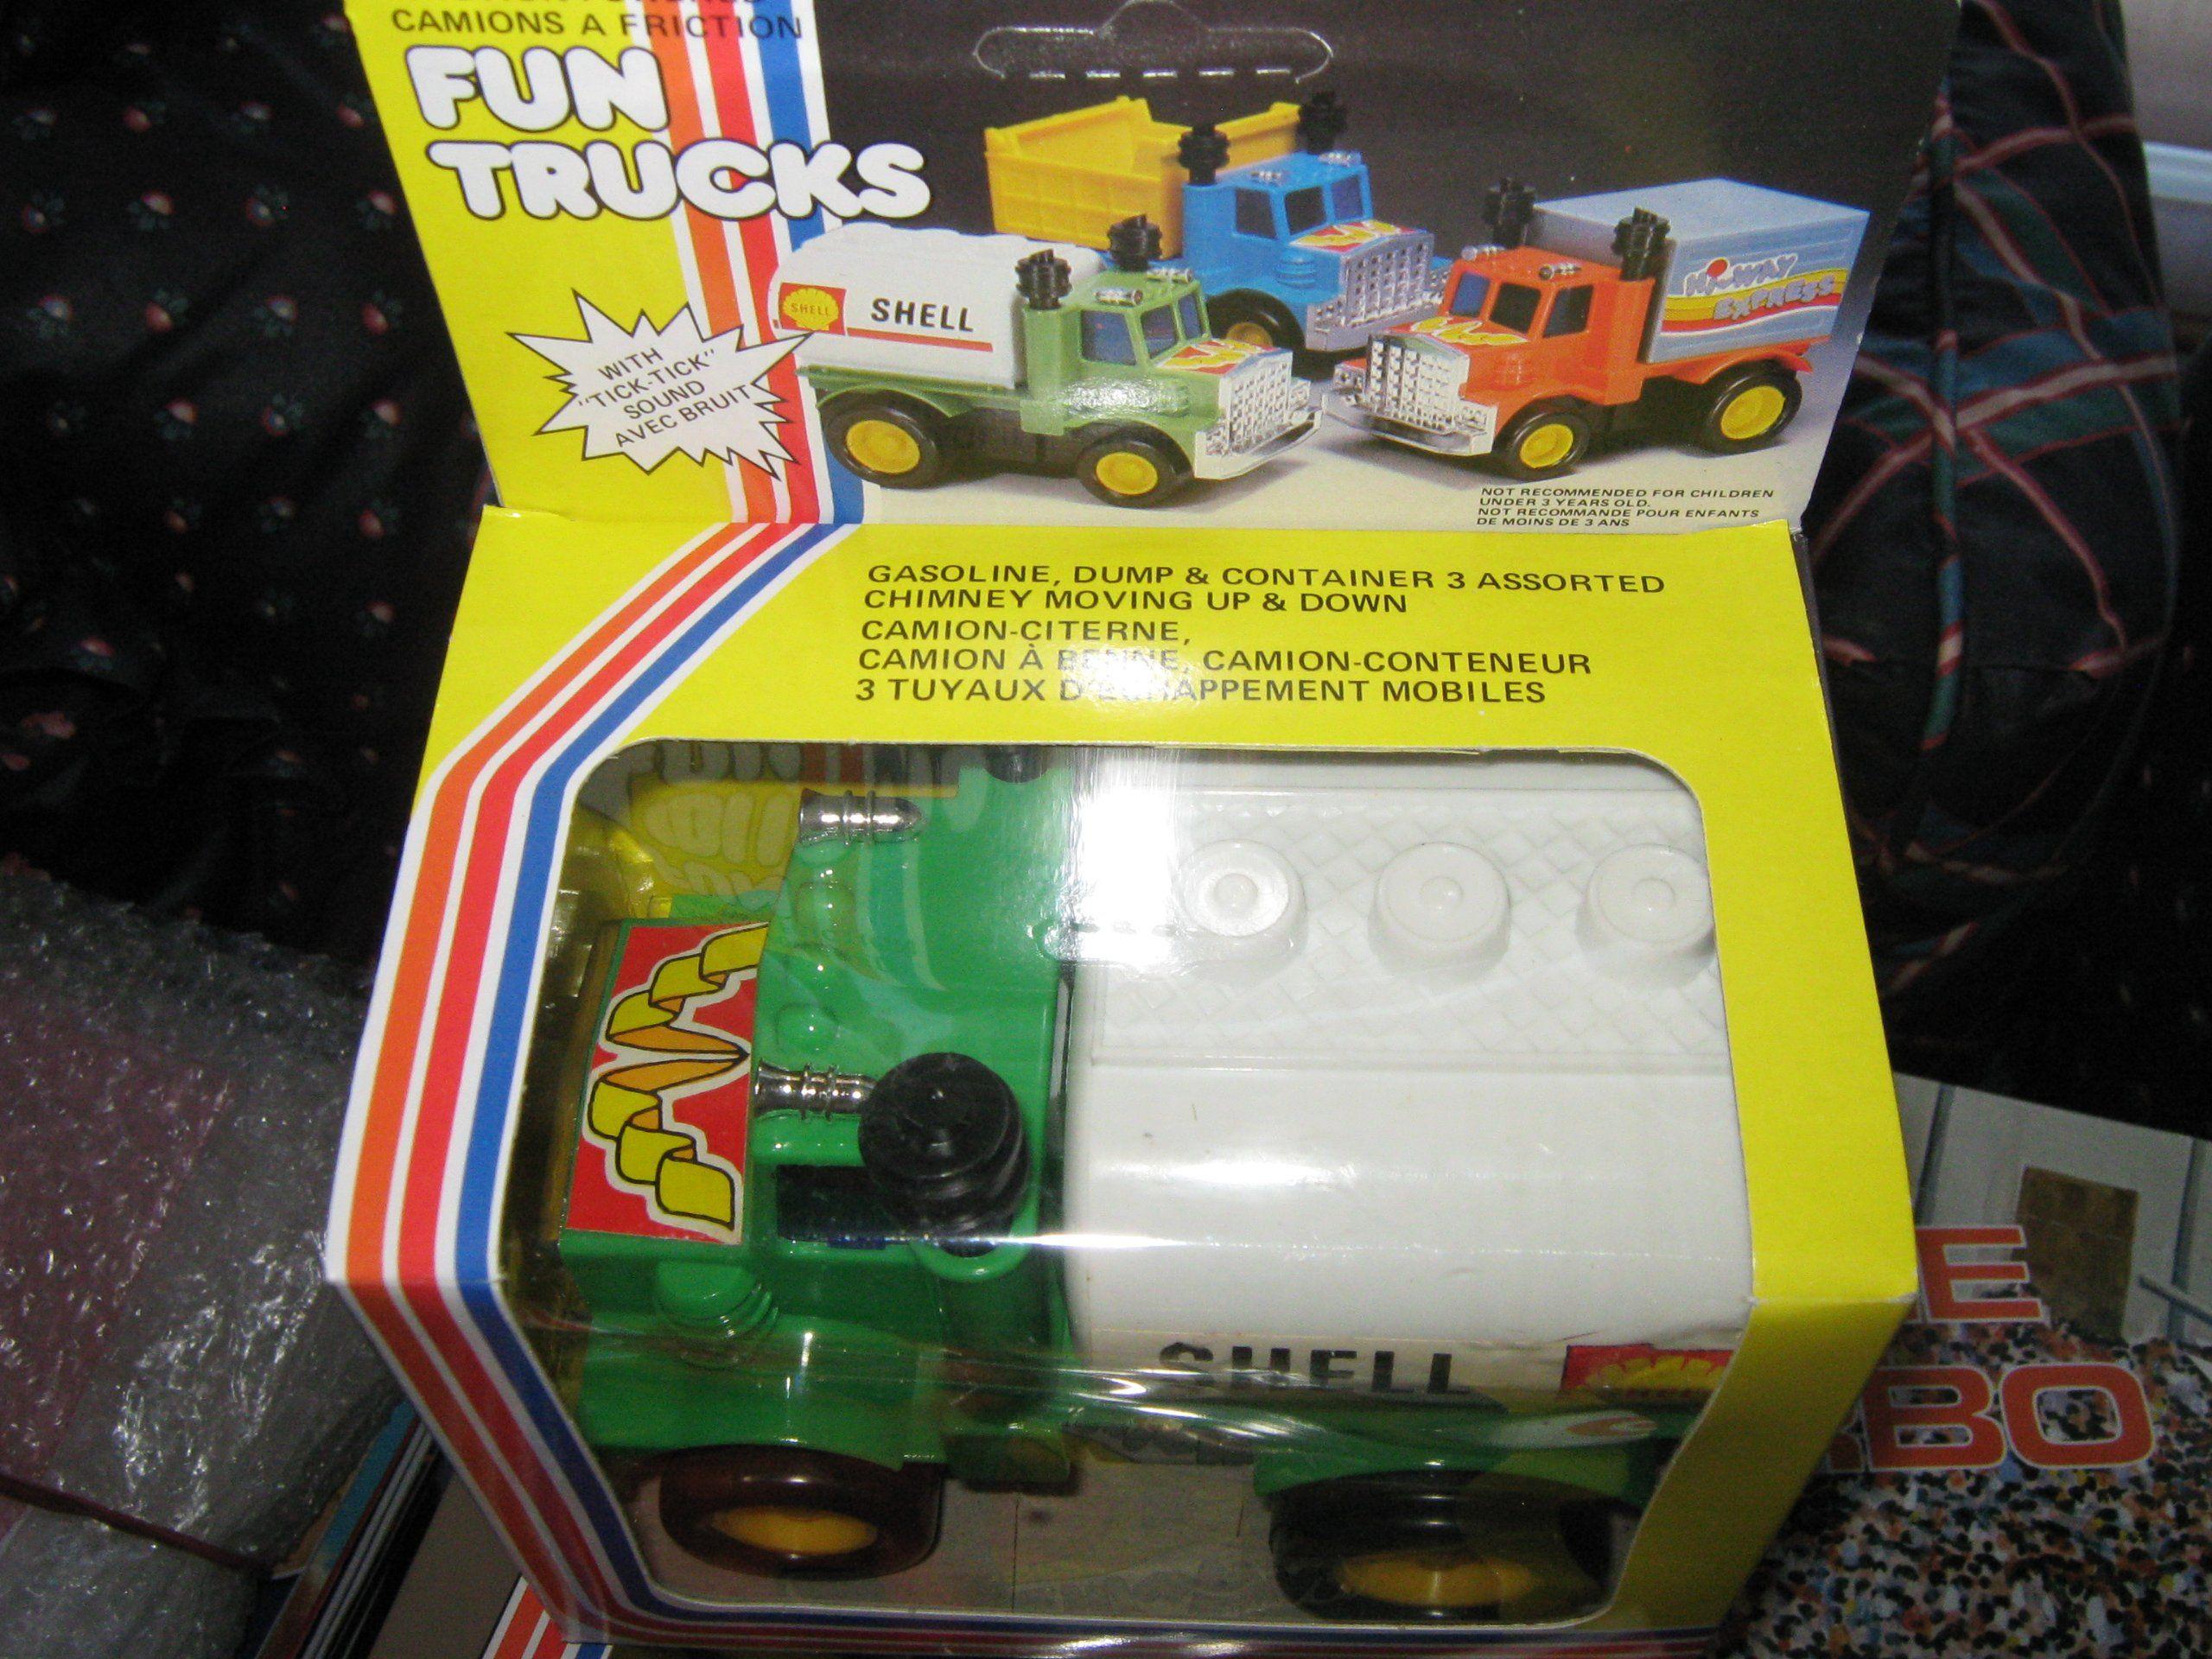 Shell Gasoline Fun Truck Friction Powered Ticktock Sound